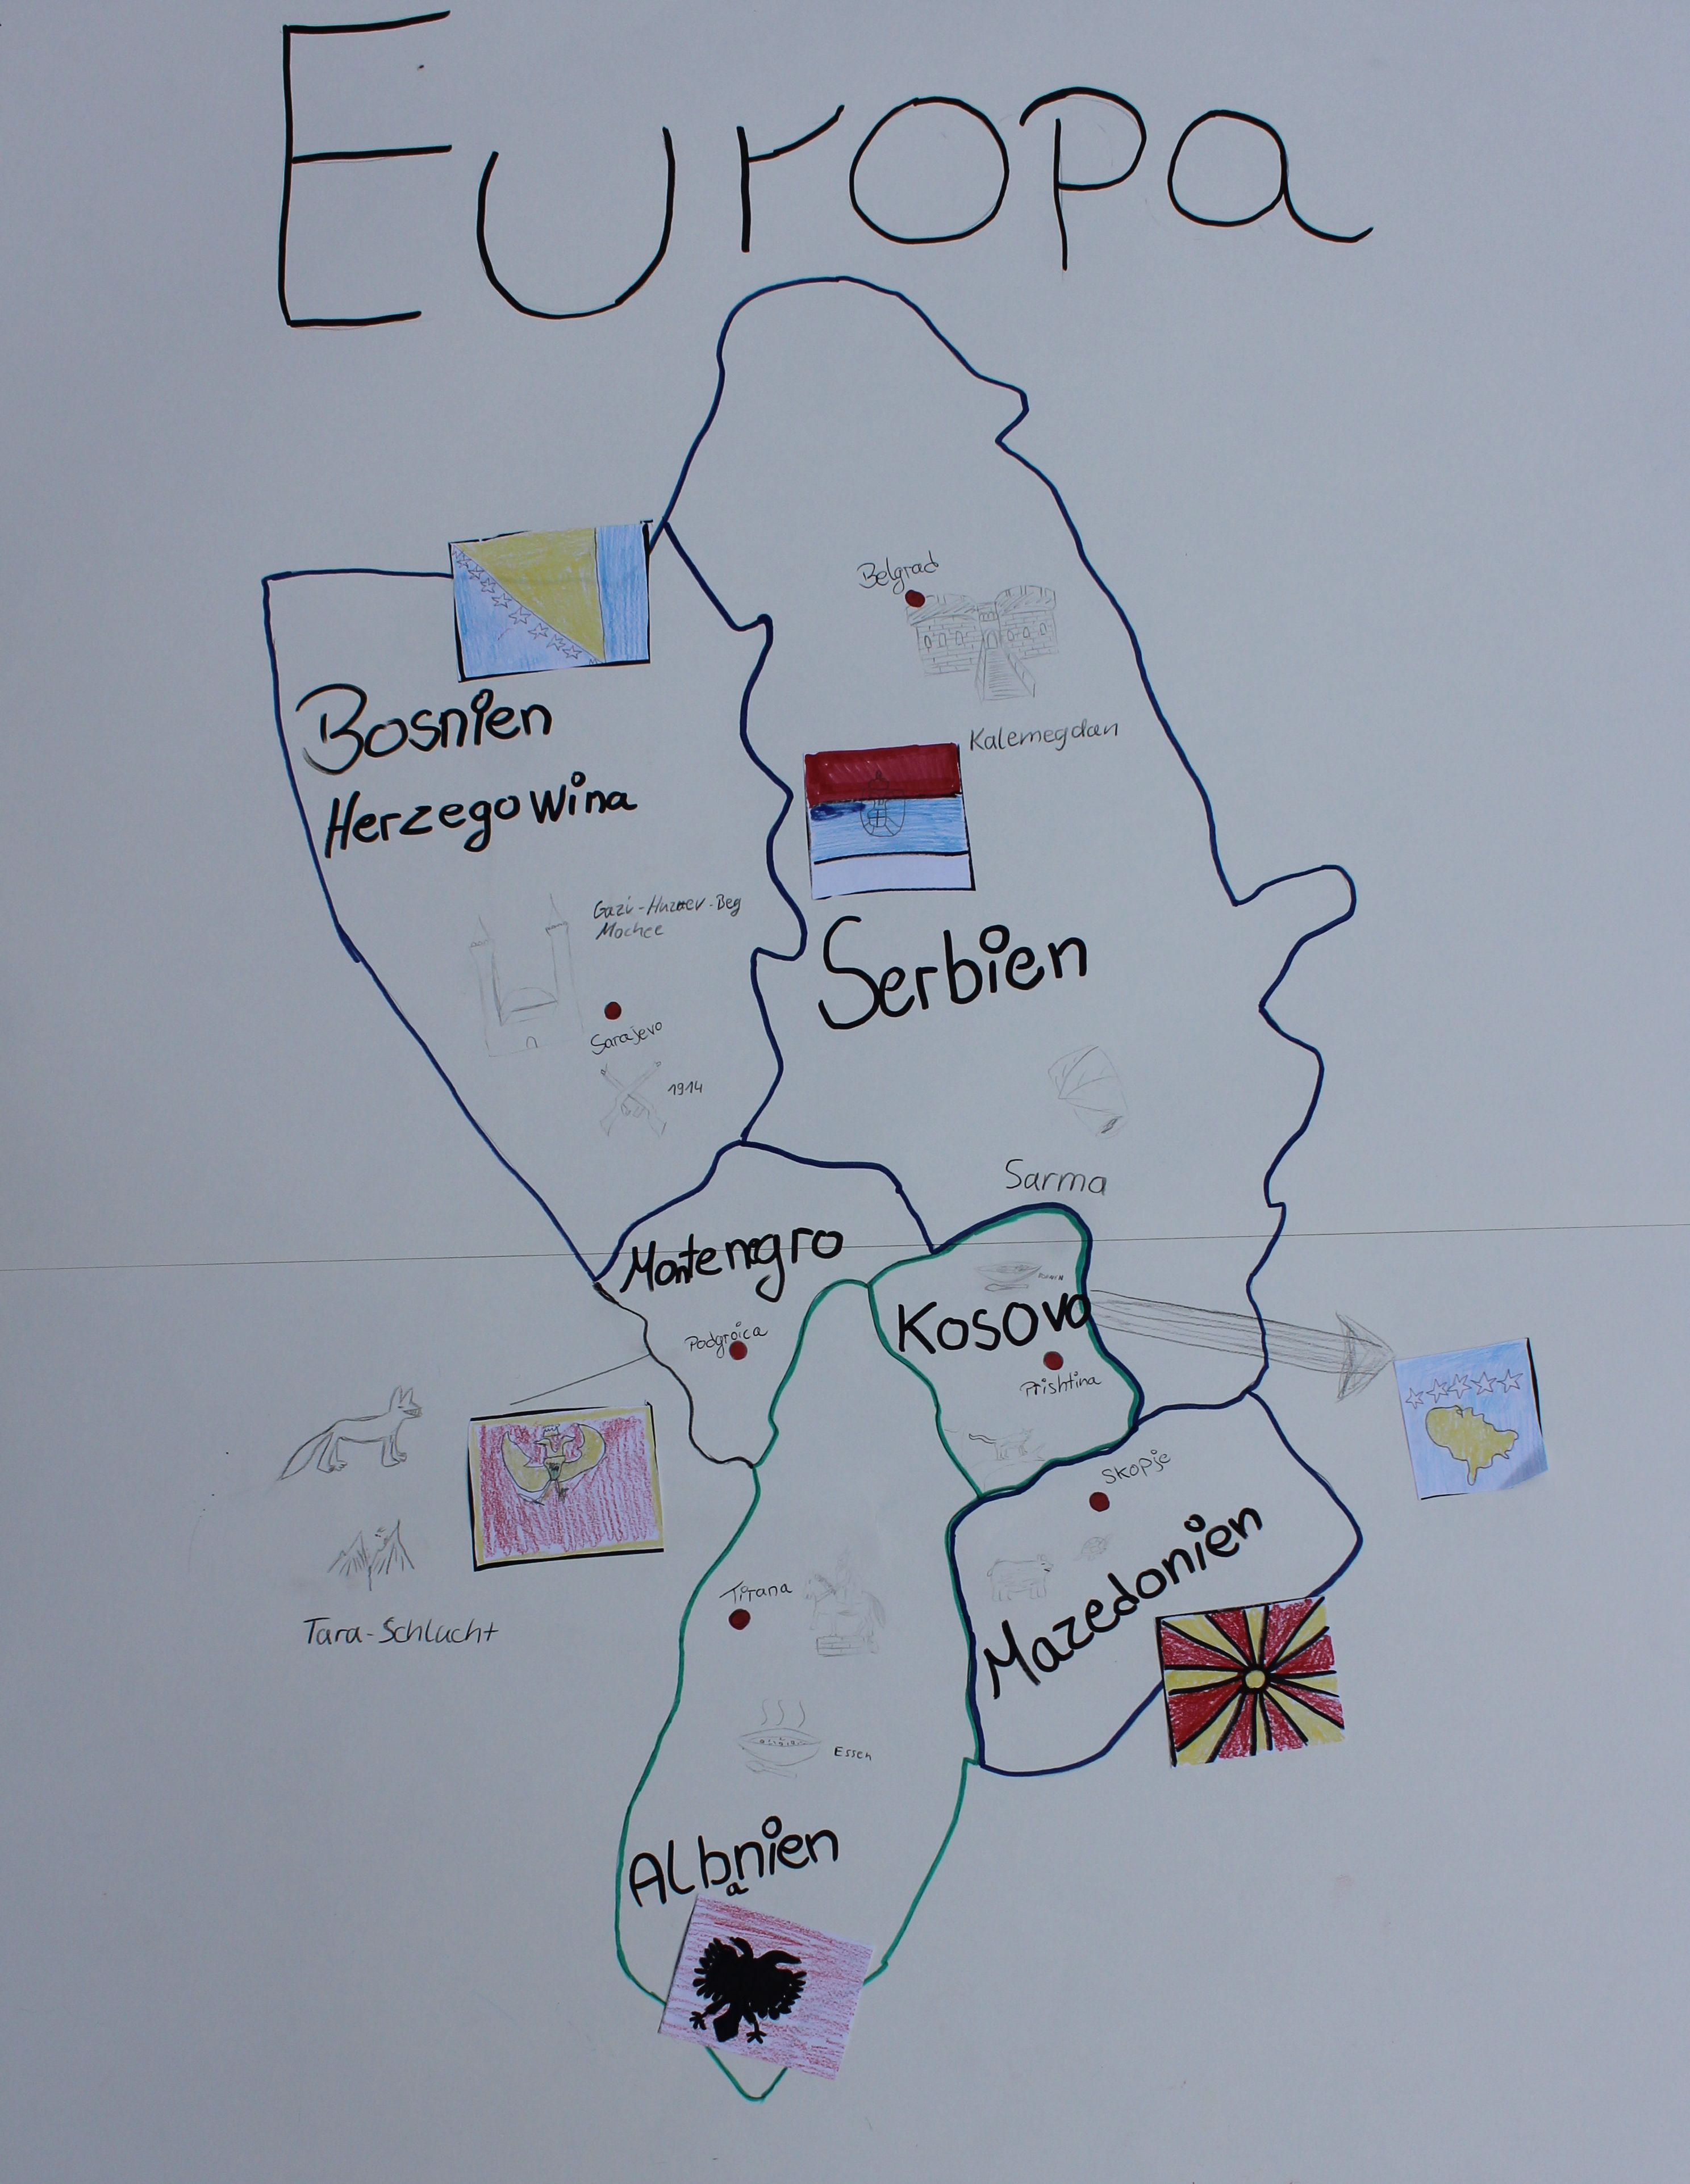 Landkarte Europa 19102018